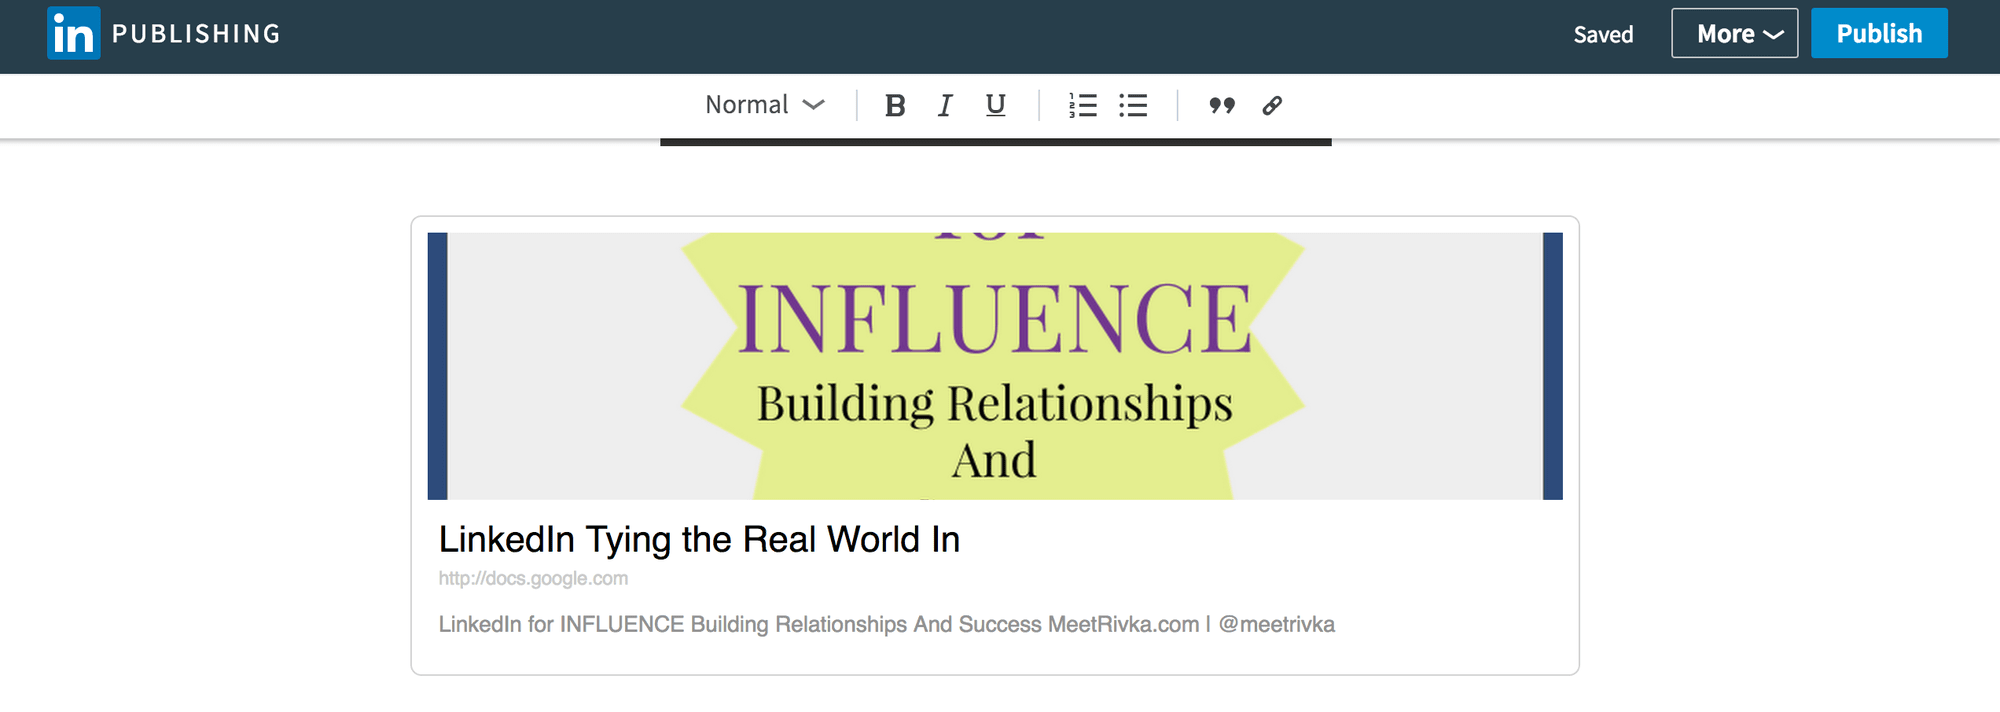 Slides display on LinkedIn Publishing